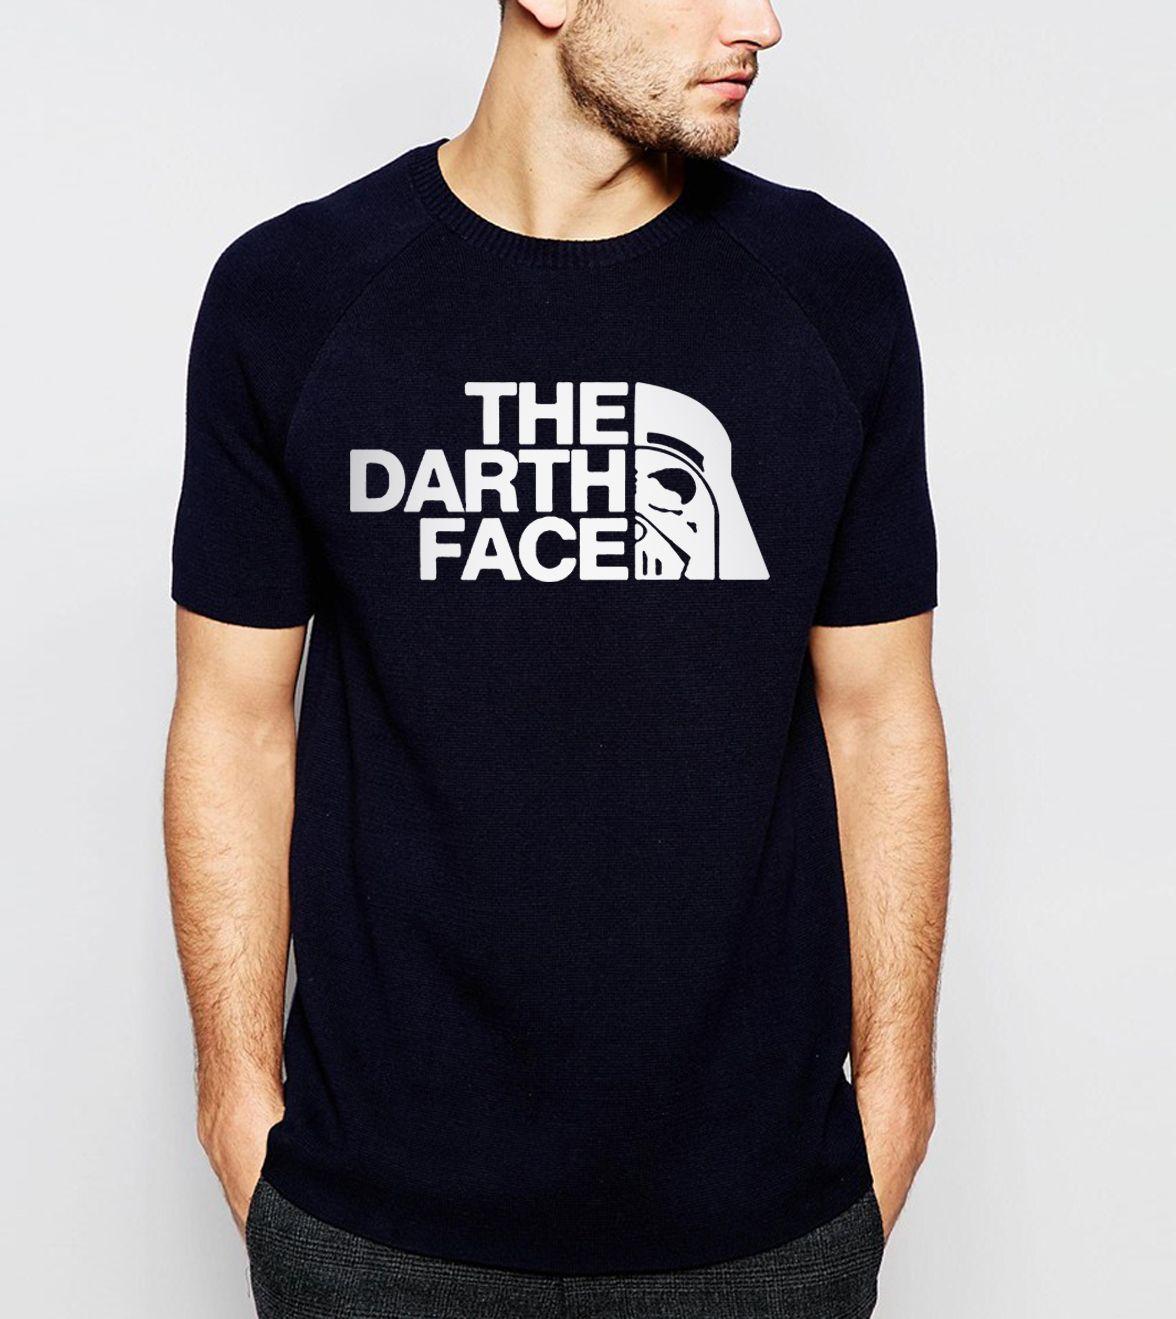 hot sale 2017 Summer New Fashion Men's T-shirts Star Wars The Darth Face T shirt 100% Cotton High Quality Short Sleeve Shirt